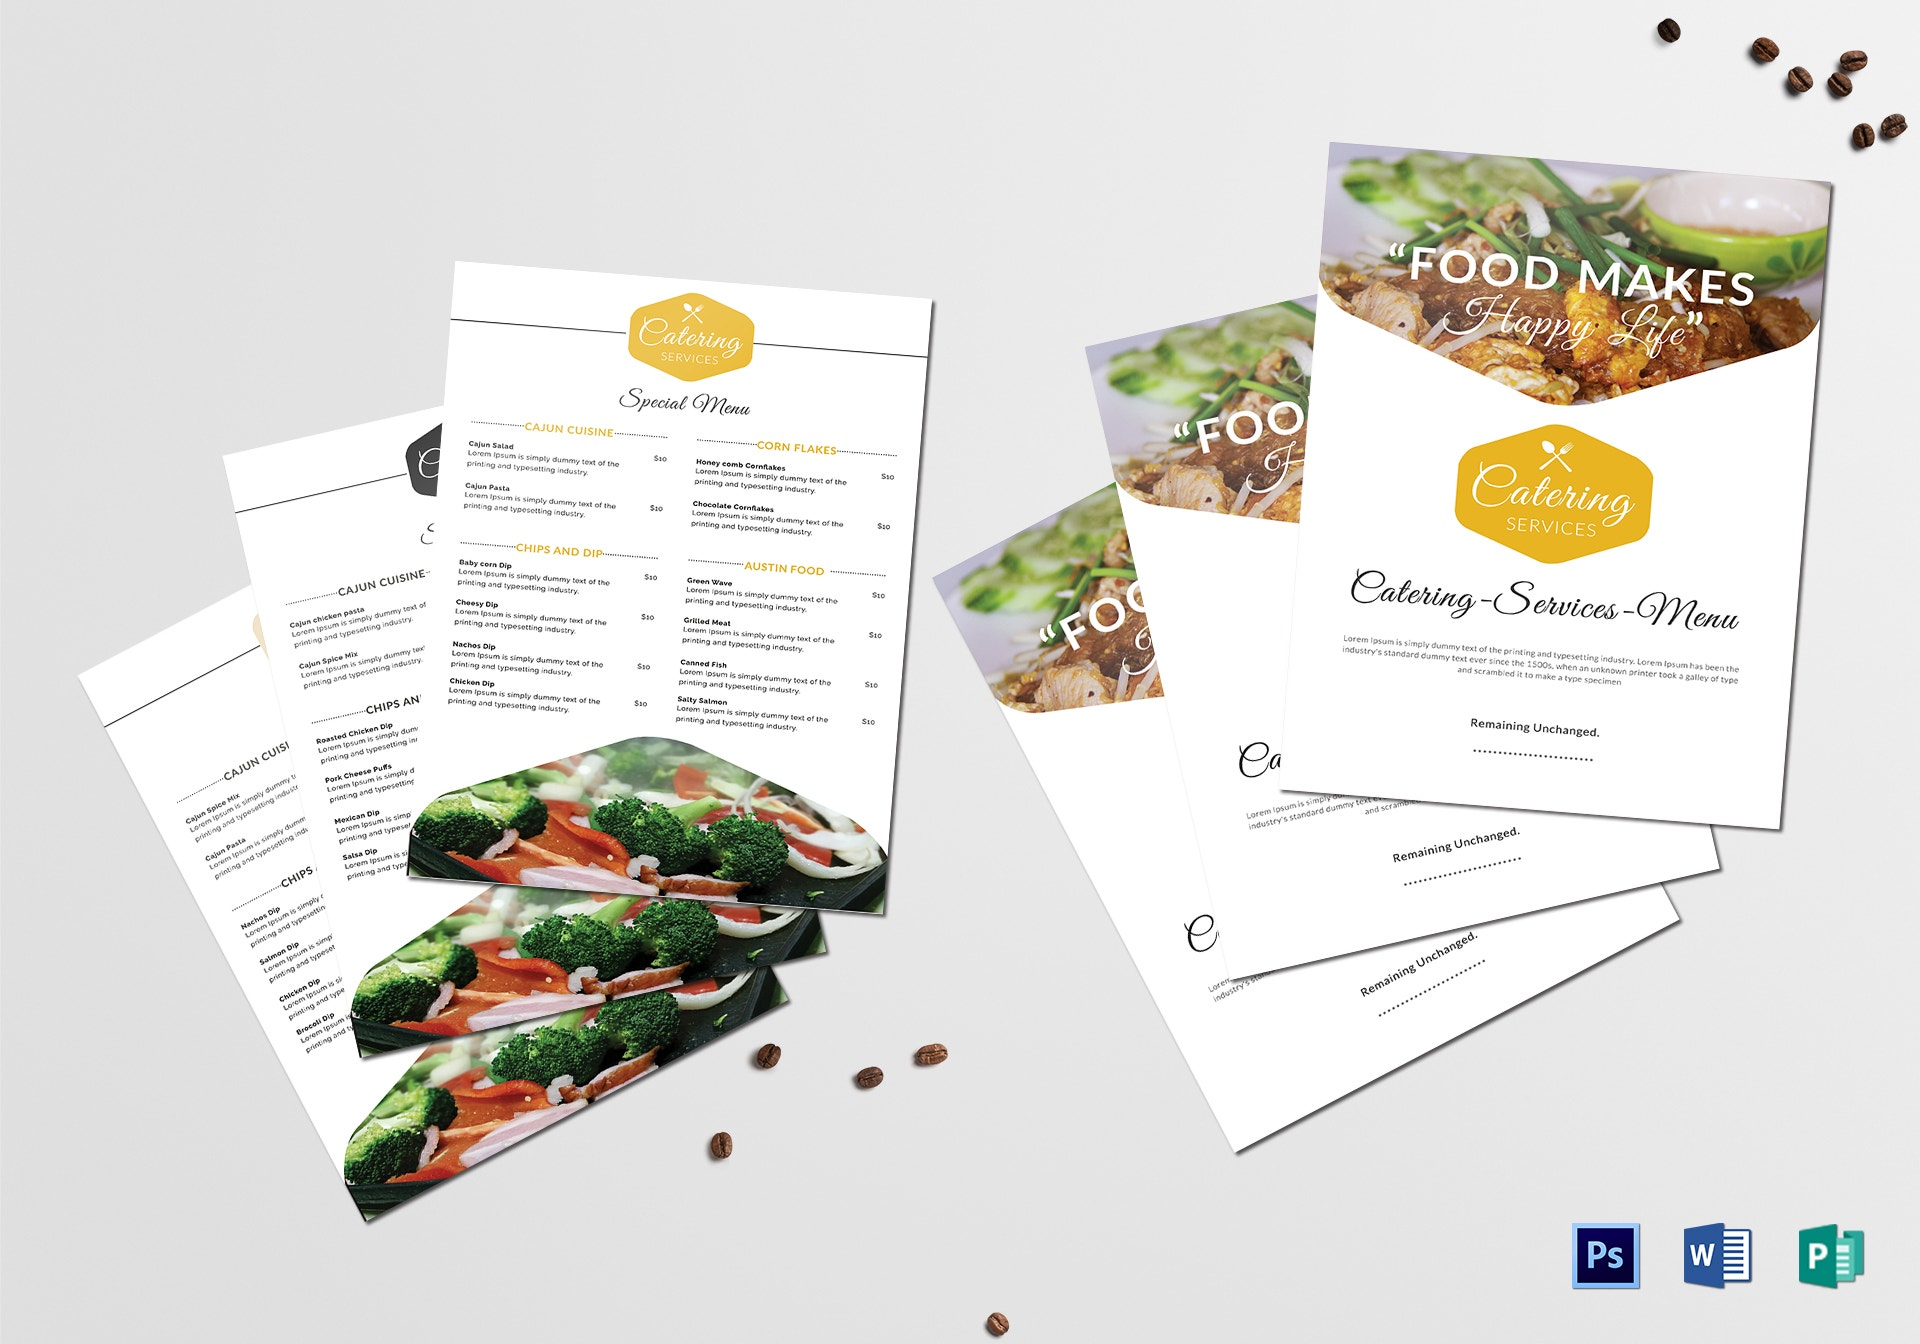 food catering services menu sample